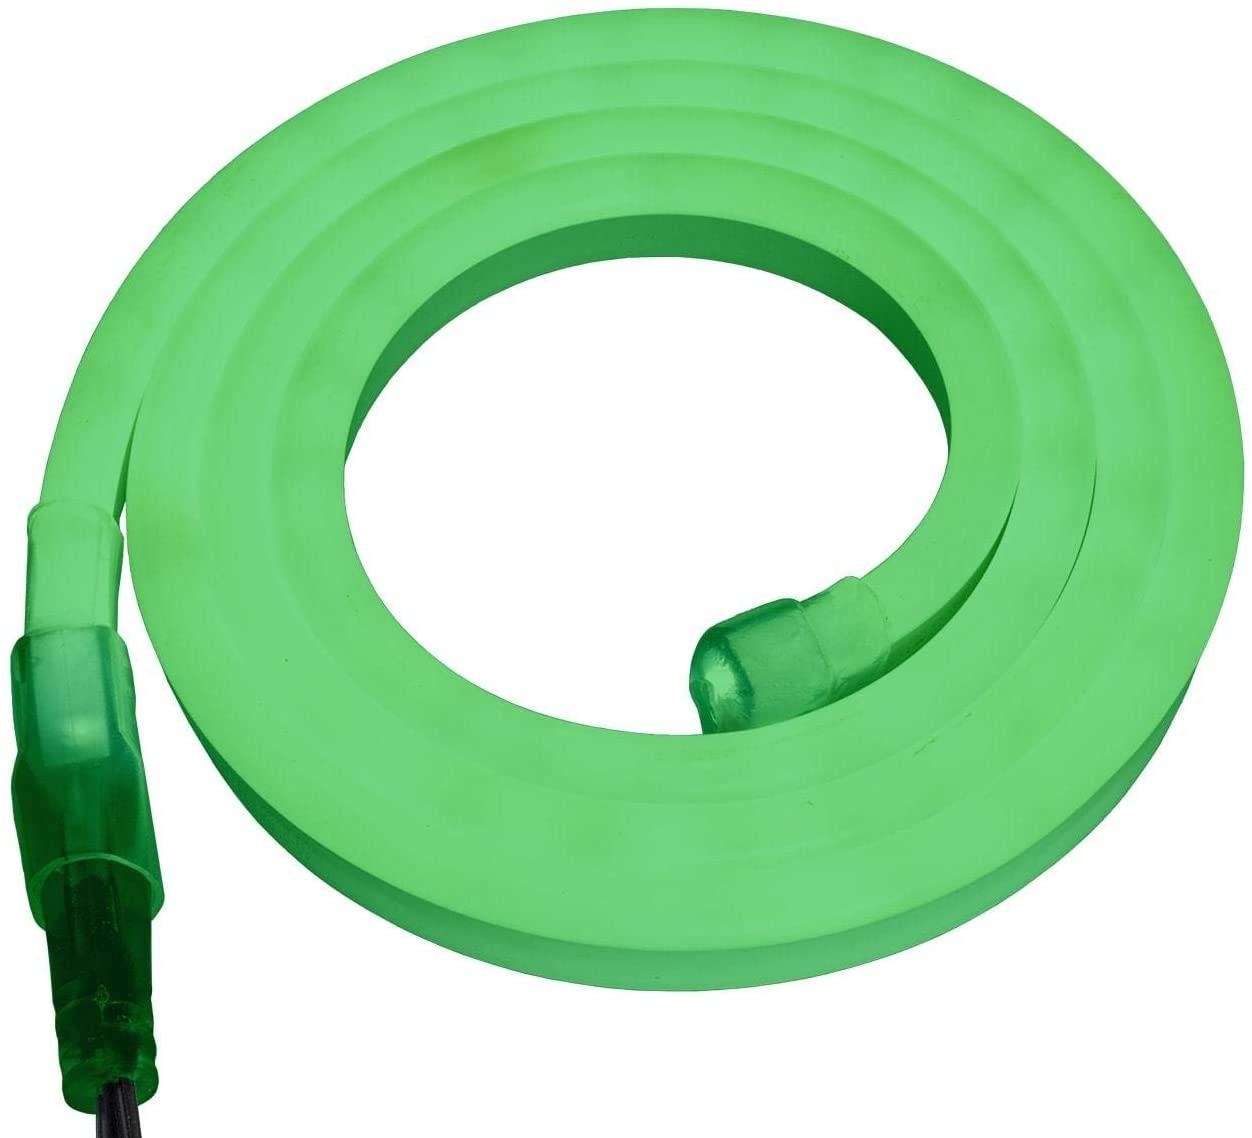 Brilliant Brand Lighting Green SMD LED Neon Strip Light - 120 Volt - Custom Cut - 18.04 Feet